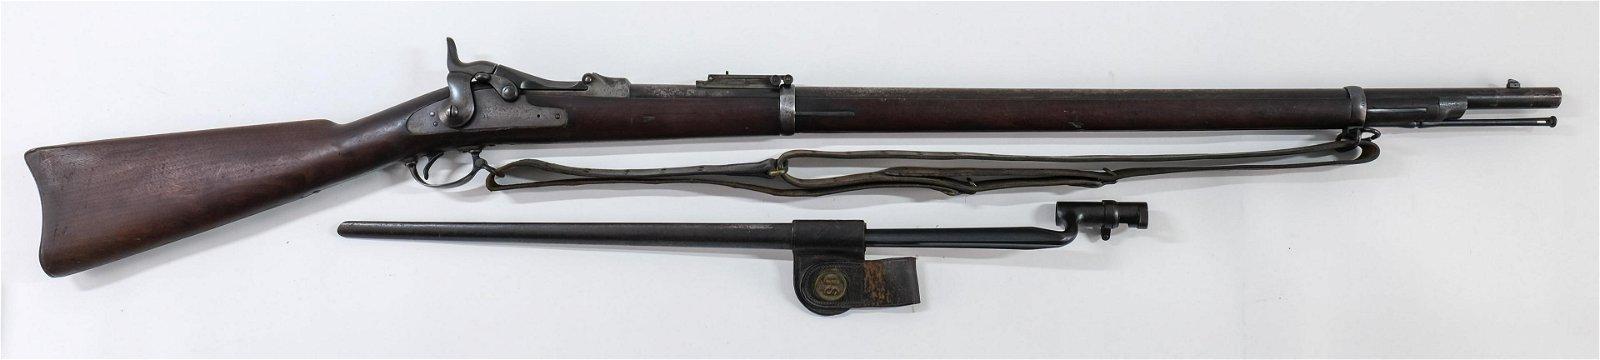 Springfield 1884 Trapdoor Rifle